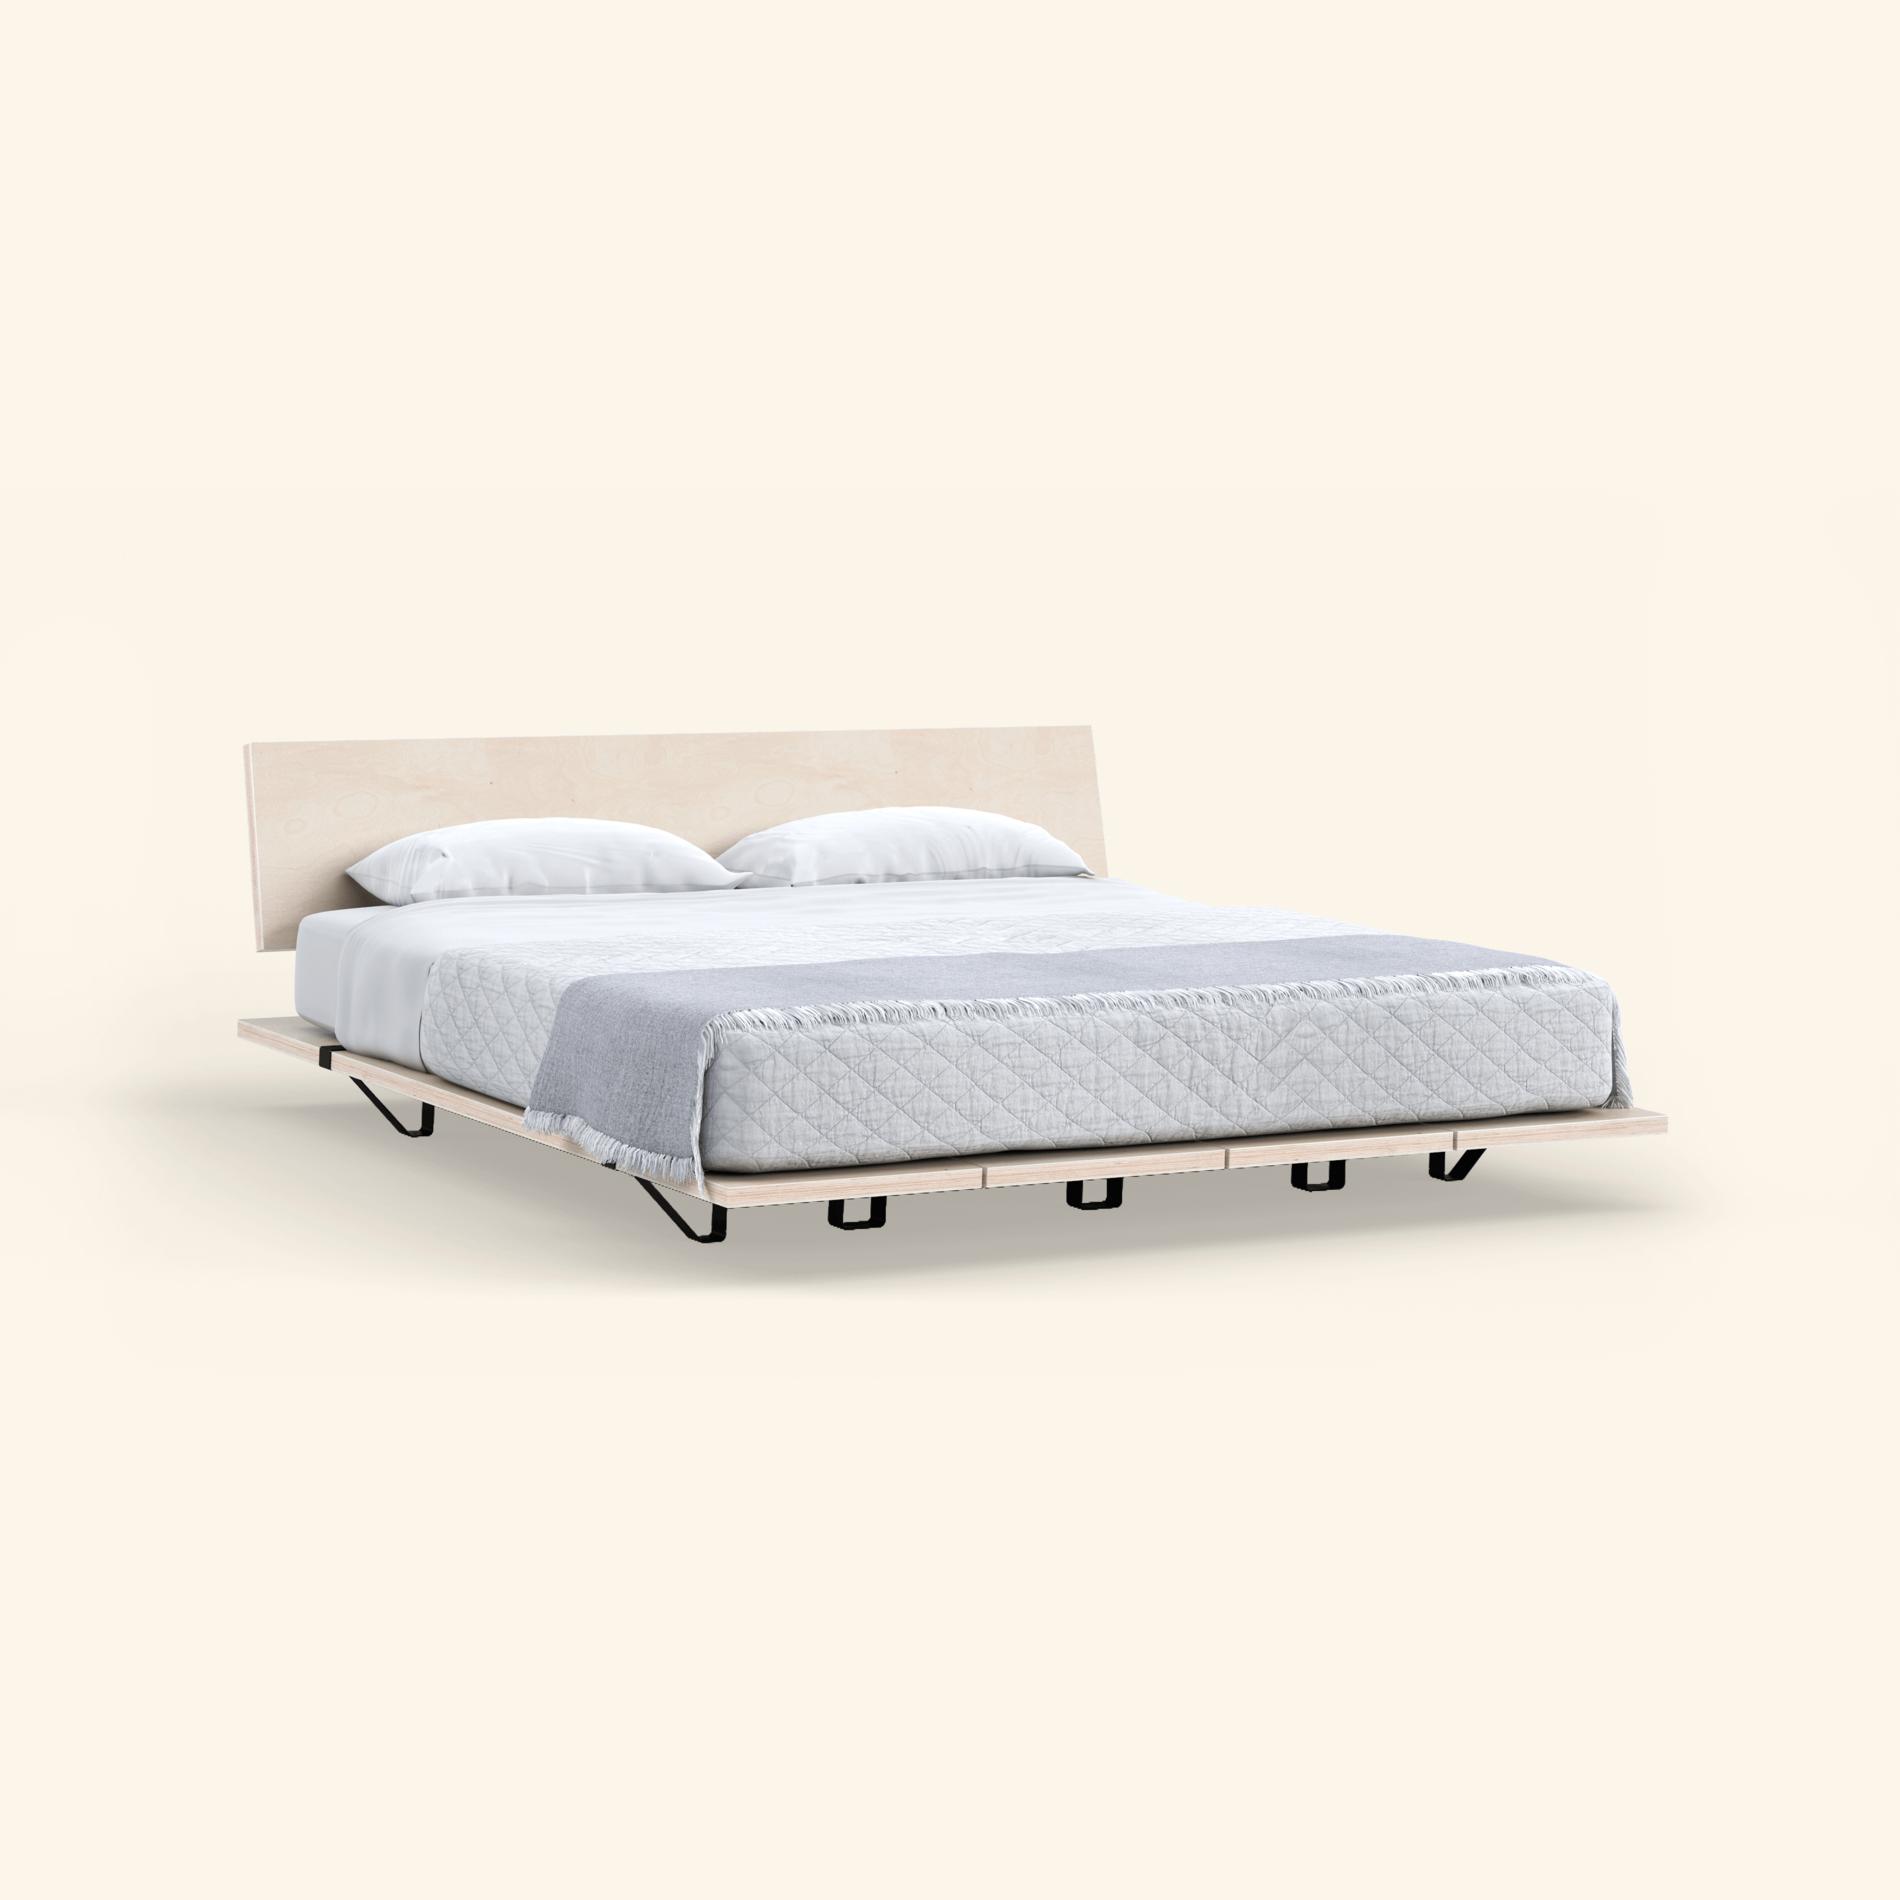 The Platform Bed FLOYD FLOYD Furniture in Pinterest